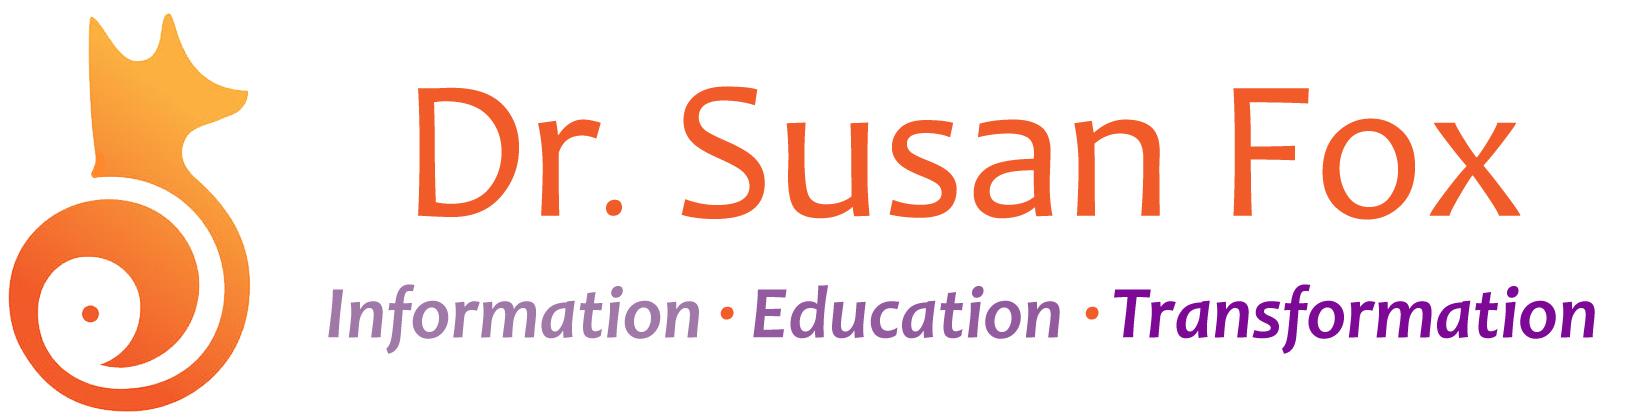 Dr. Susan Fox